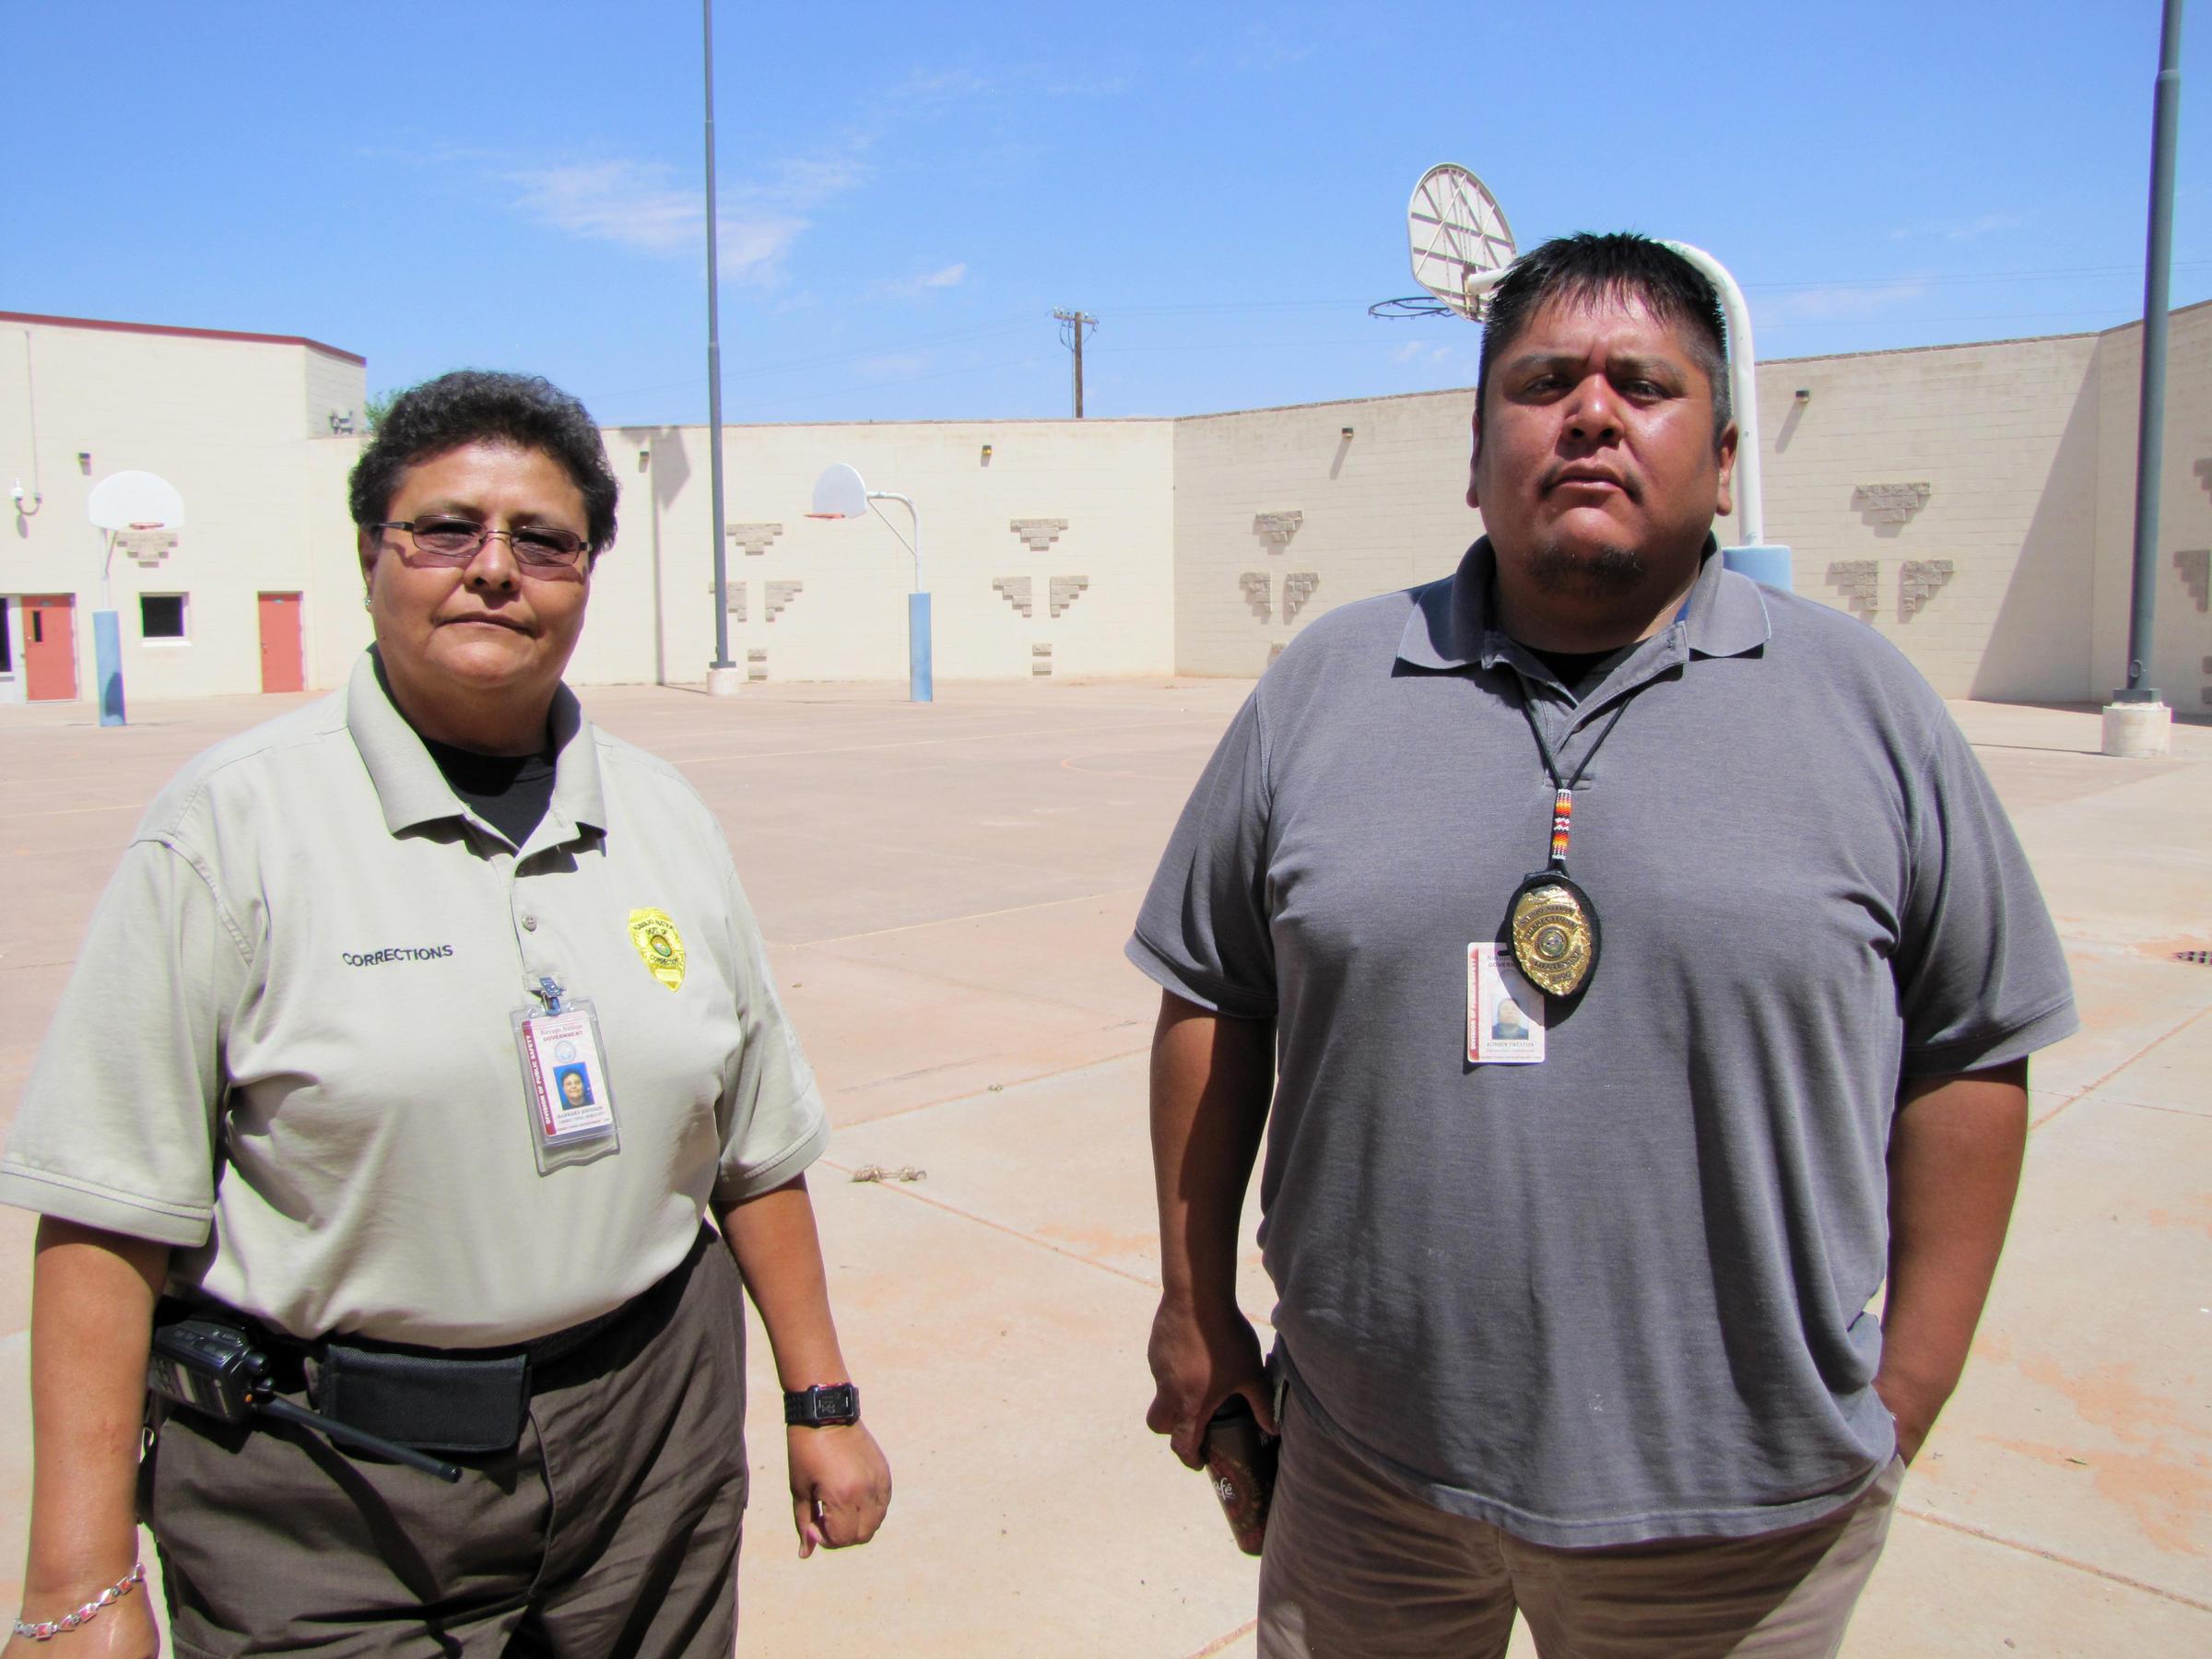 sgt barbara johnson and corrections lt robbin preston run the tuba city juvenile detention center on the navajo nation